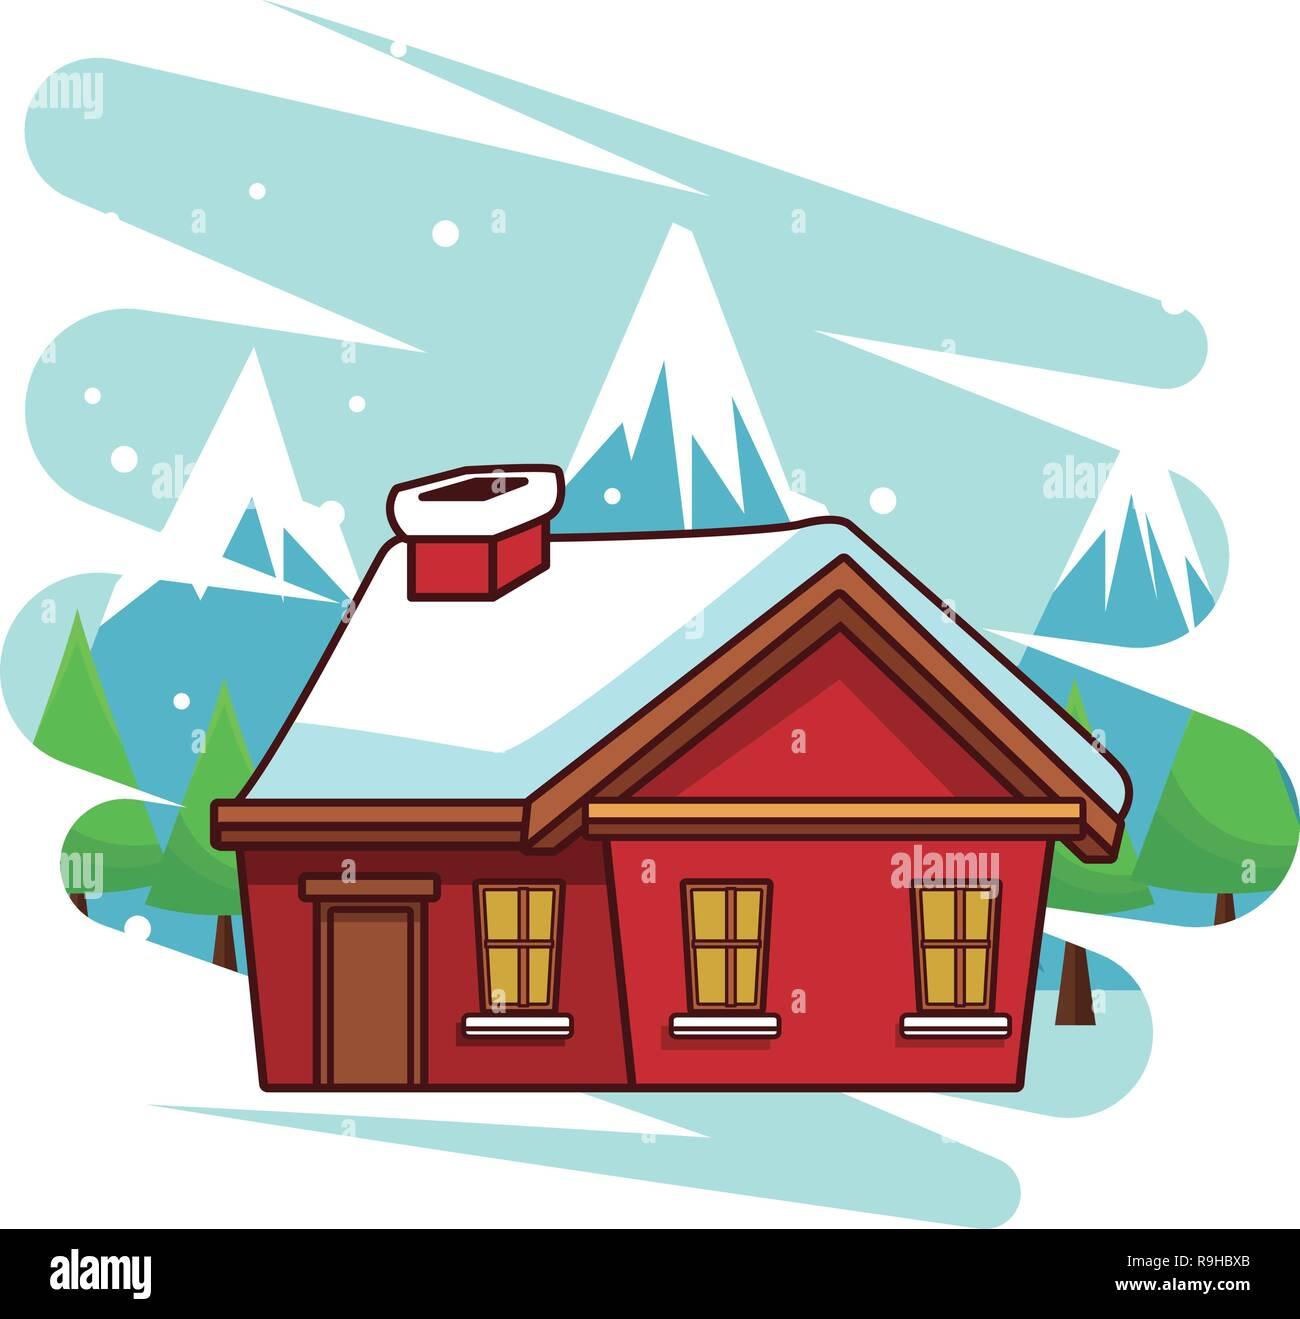 Winter House Cartoon Stock Vector Image Art Alamy